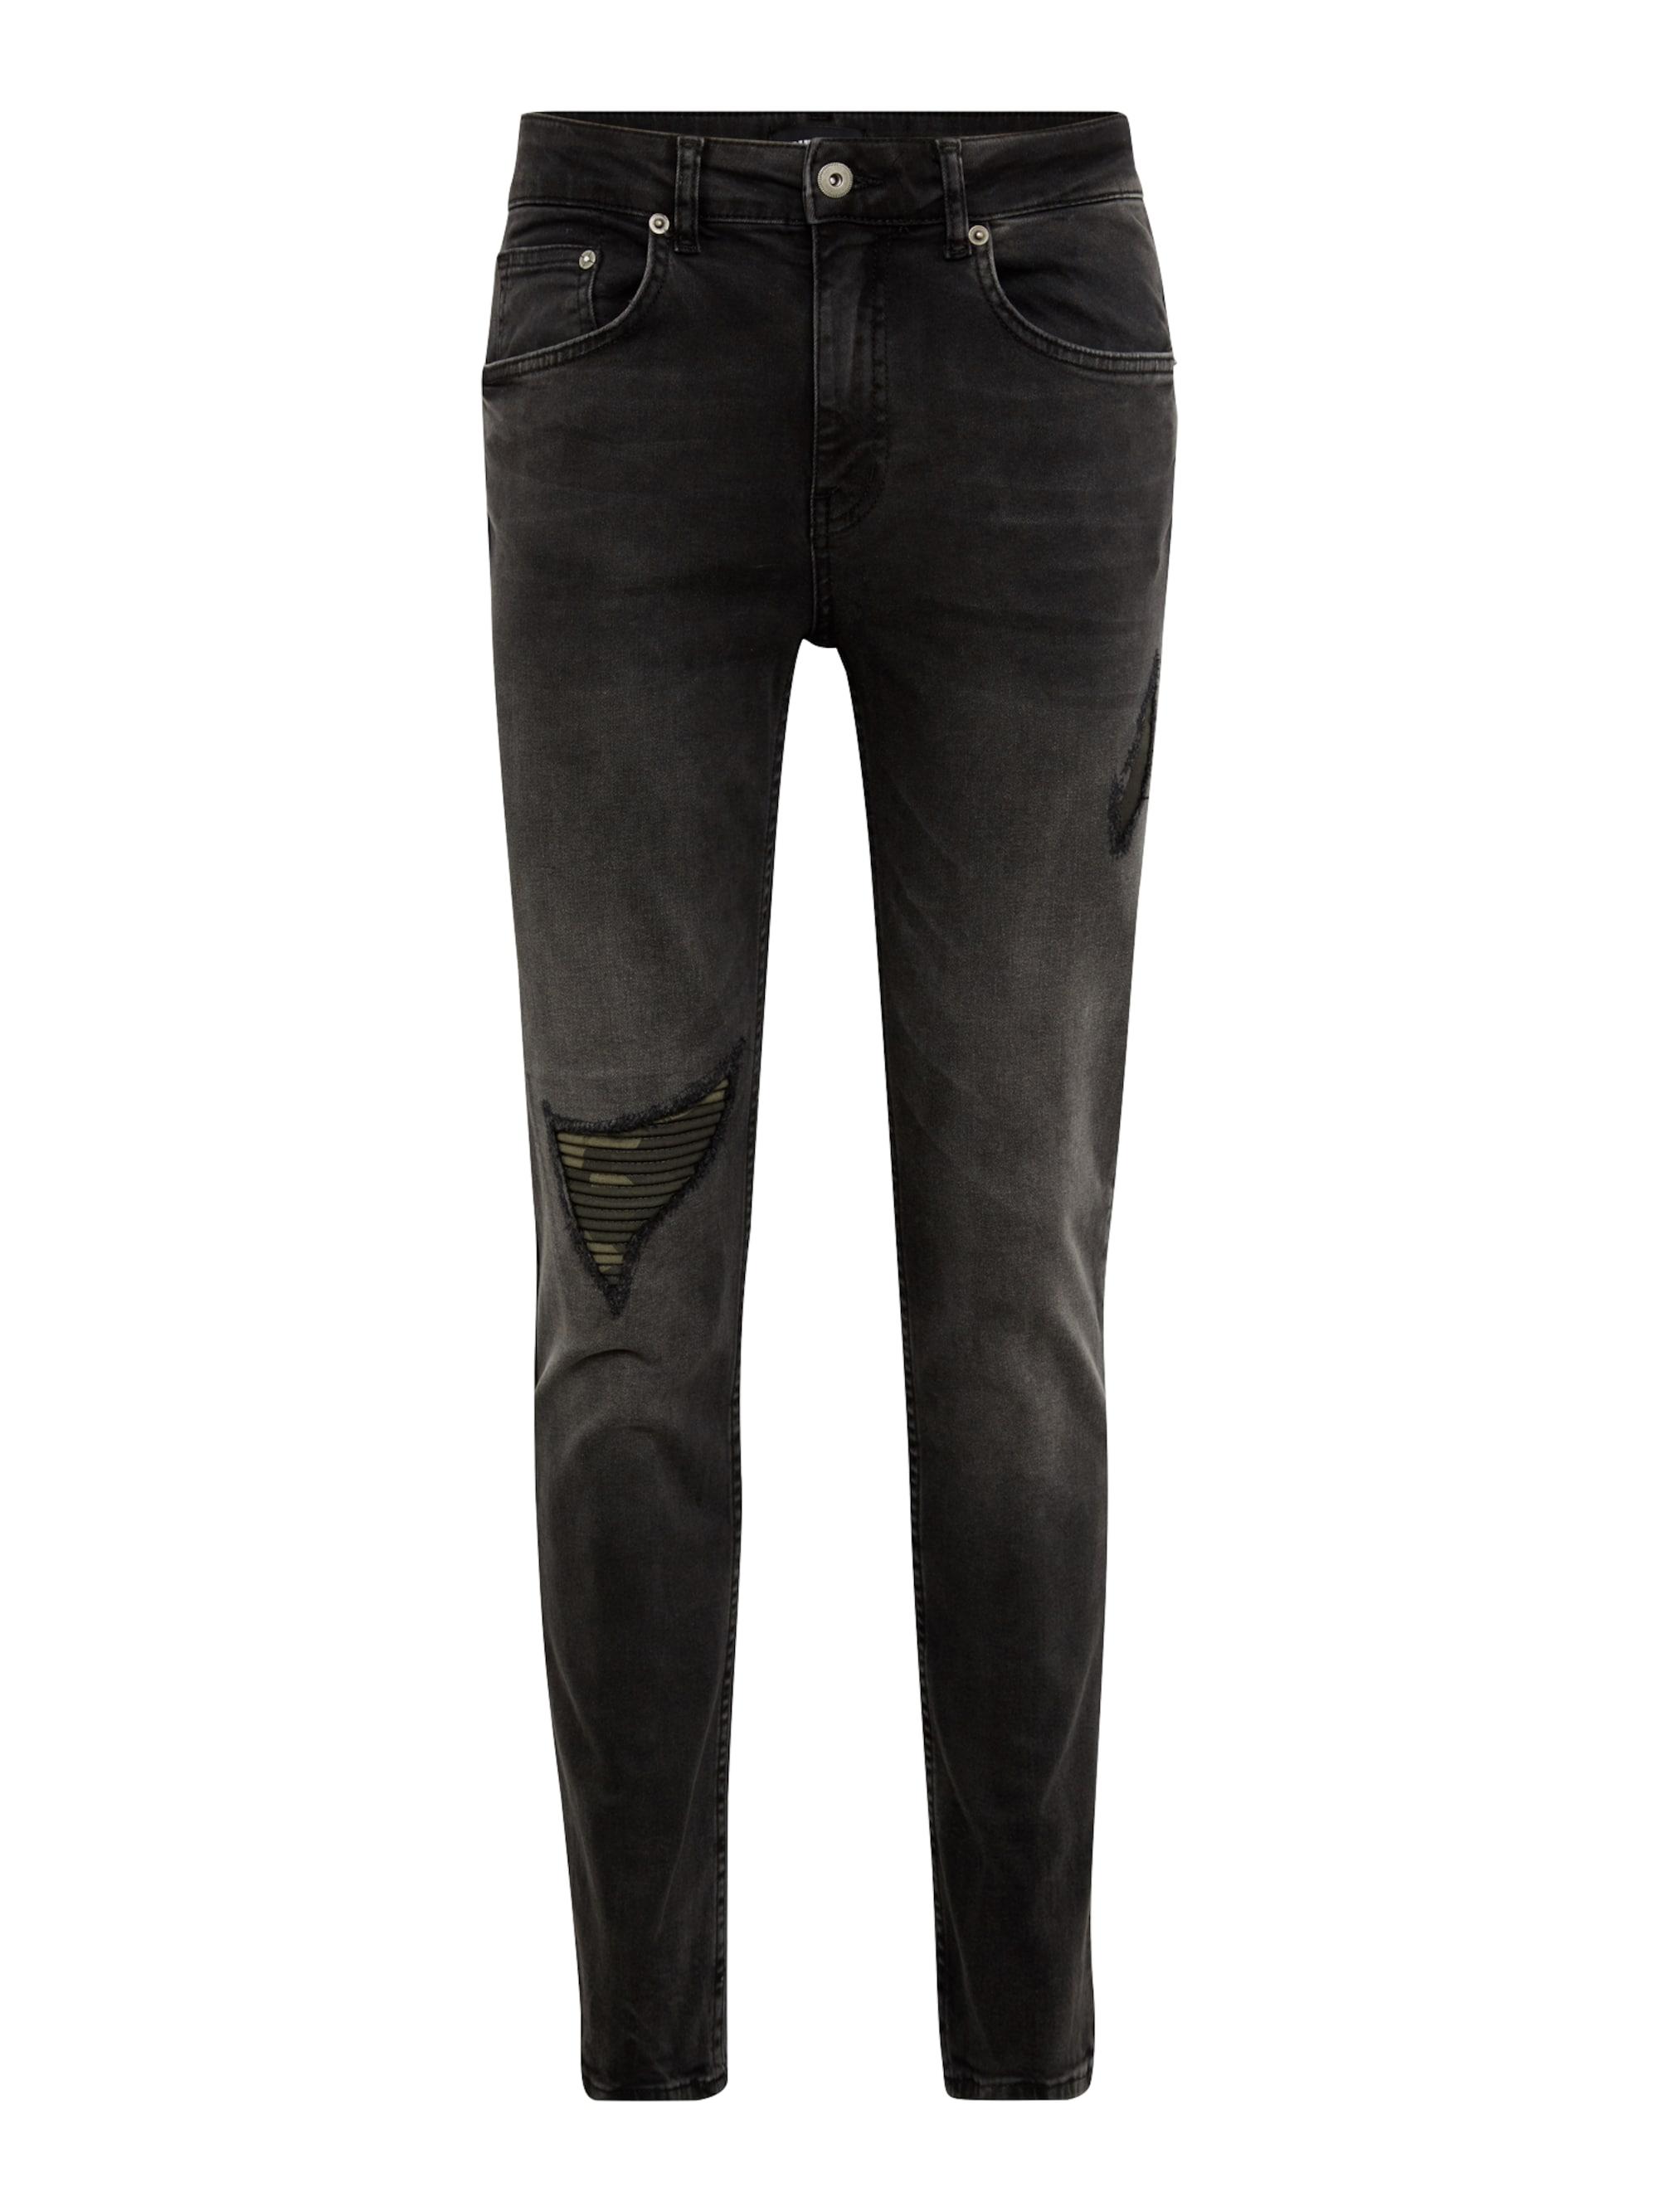 Jeans ´CAMO PATCH SLIM DENIM´